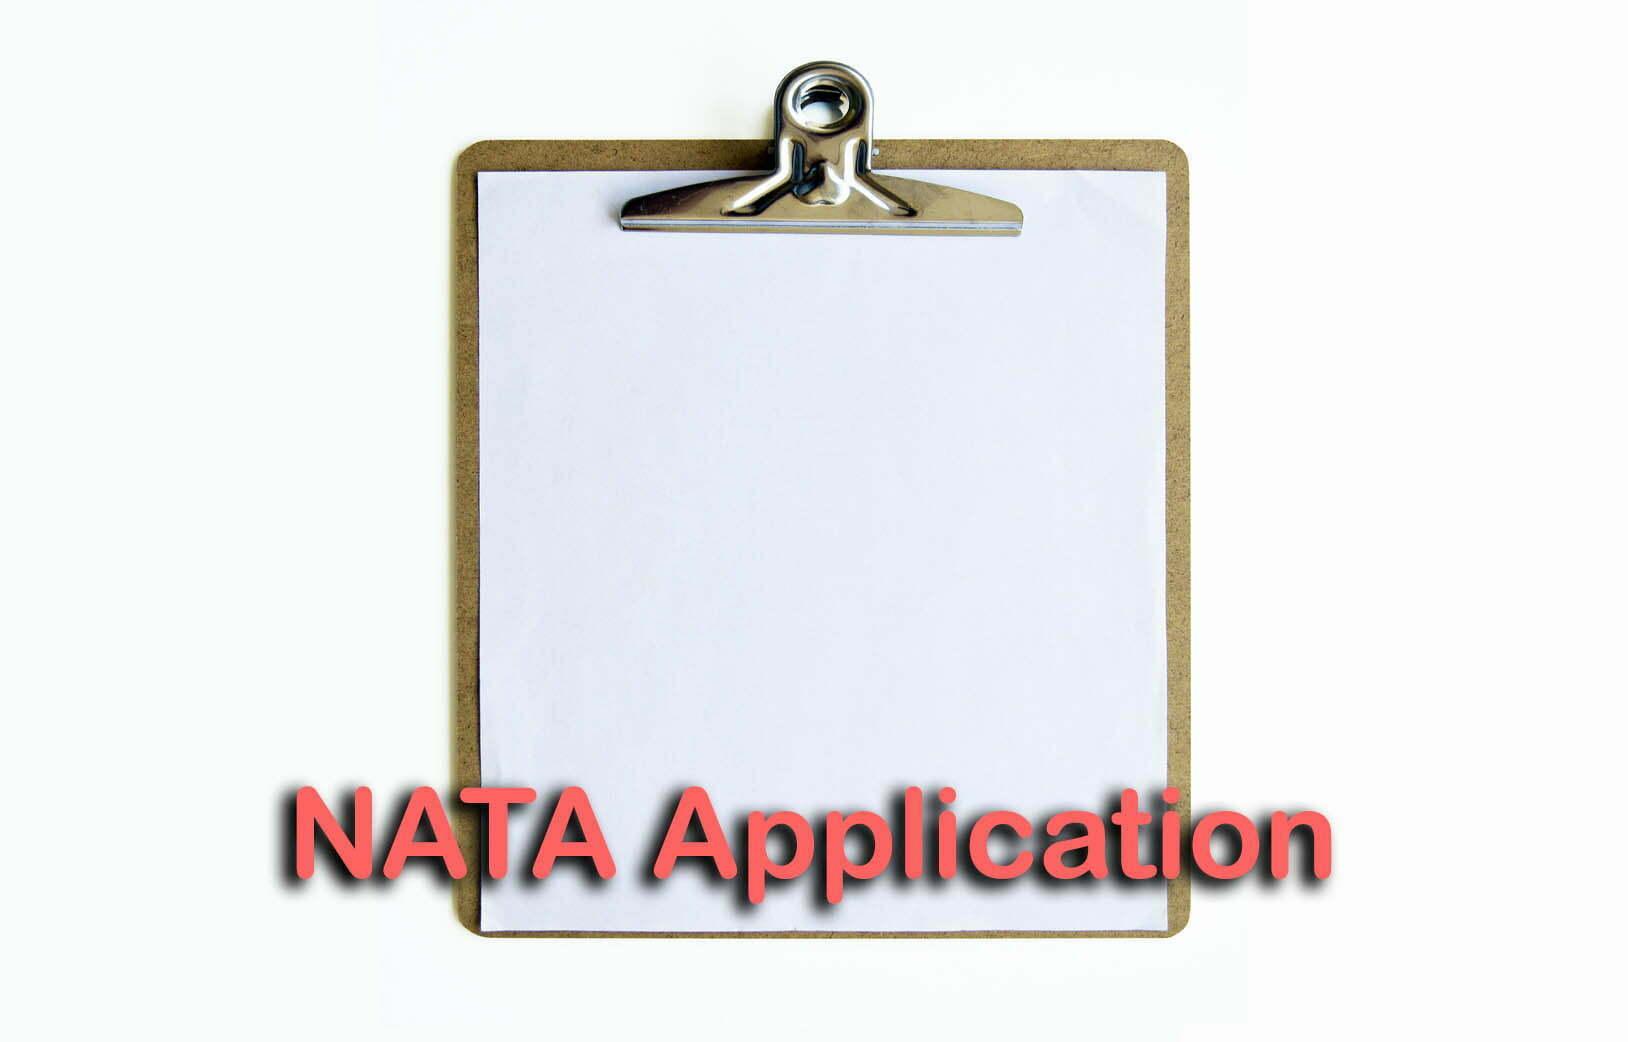 NATA Application